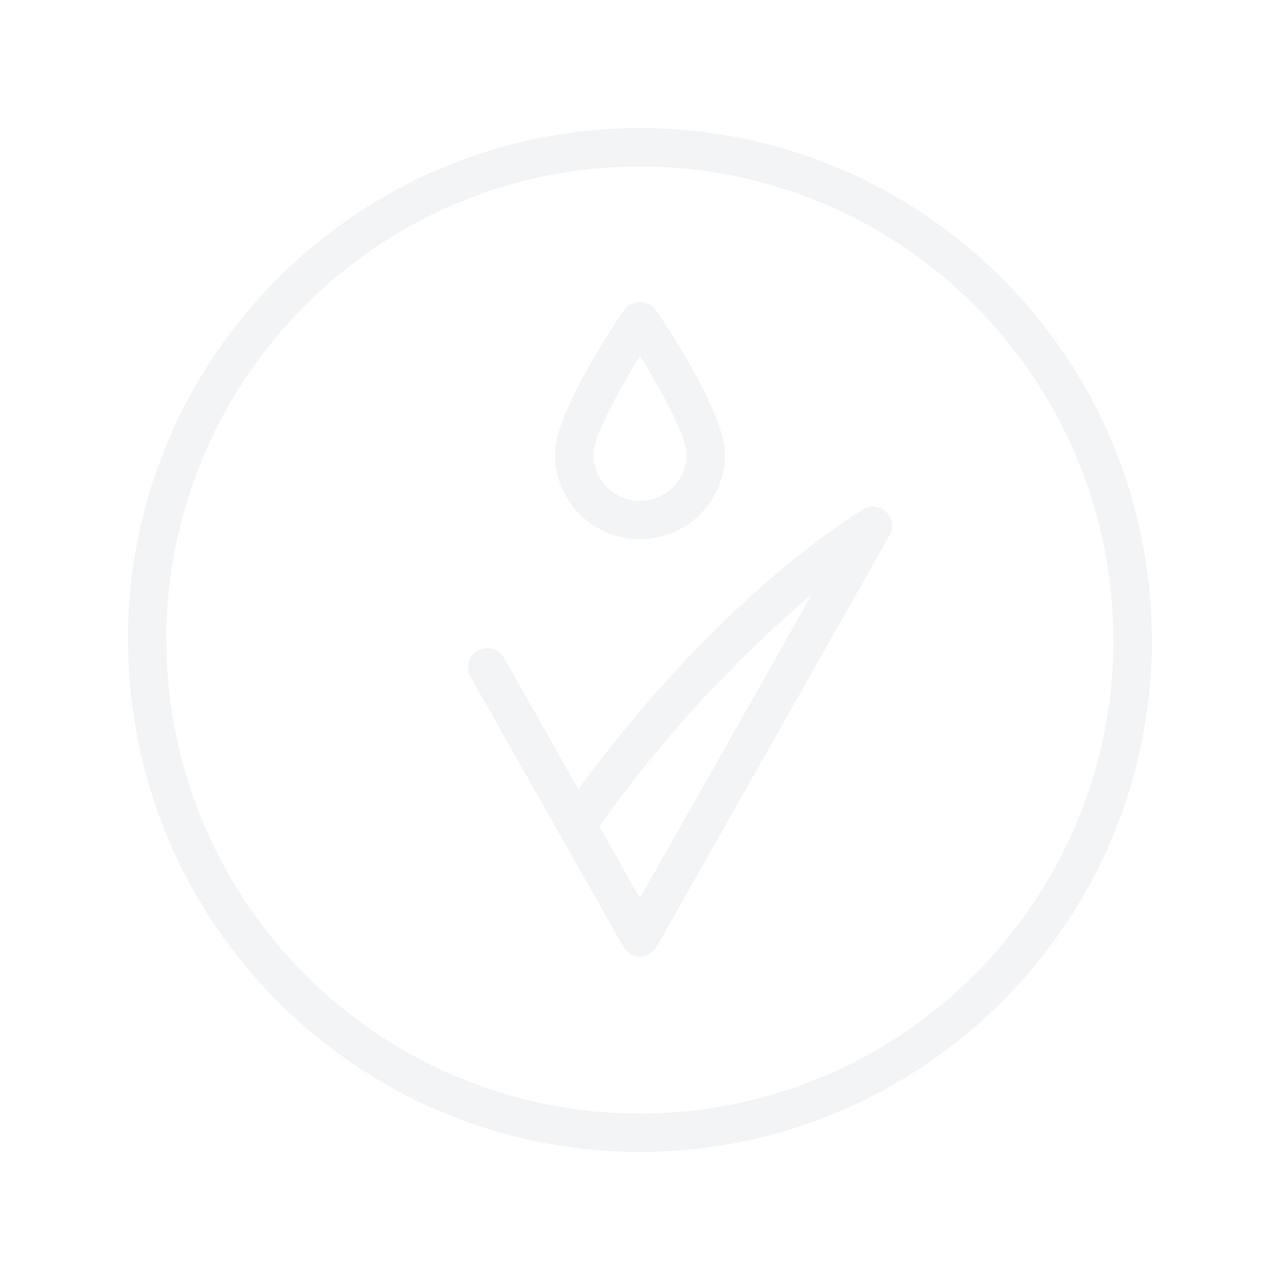 BIOSILK Silk Therapy Dry Clean Shampoo 150g